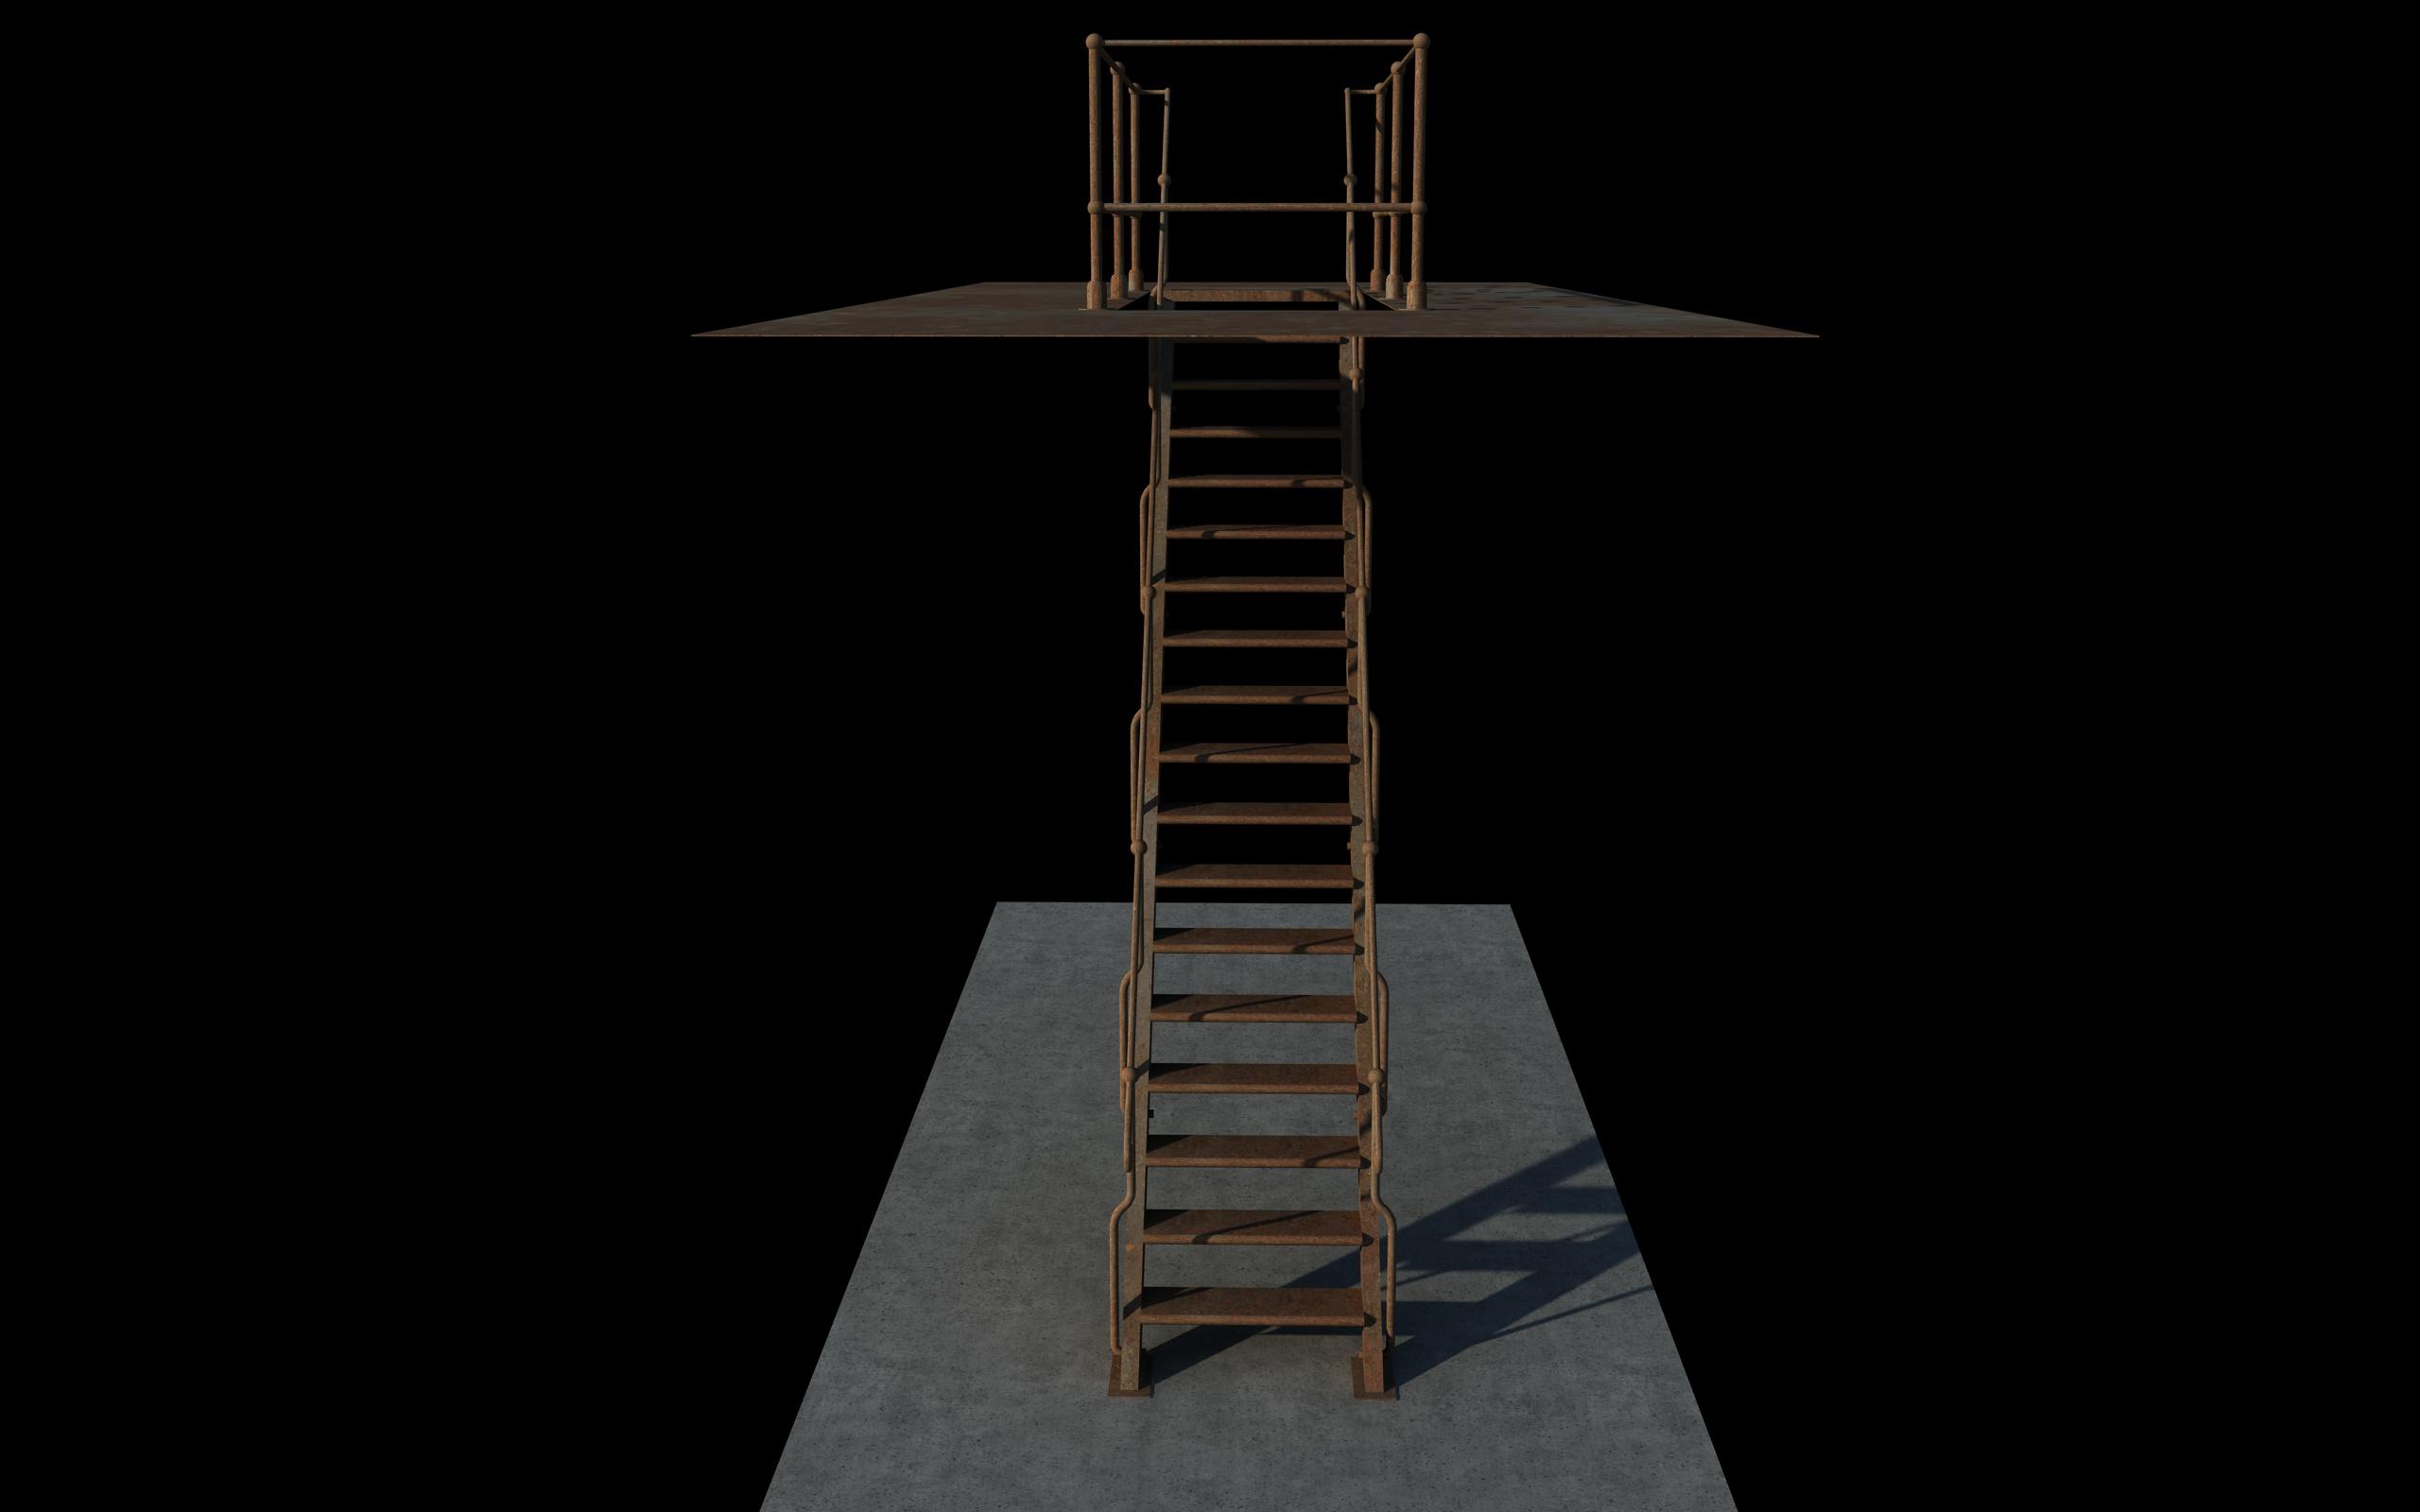 iron stair 3d obj 3d model 3ds dxf c4d skp obj 148387